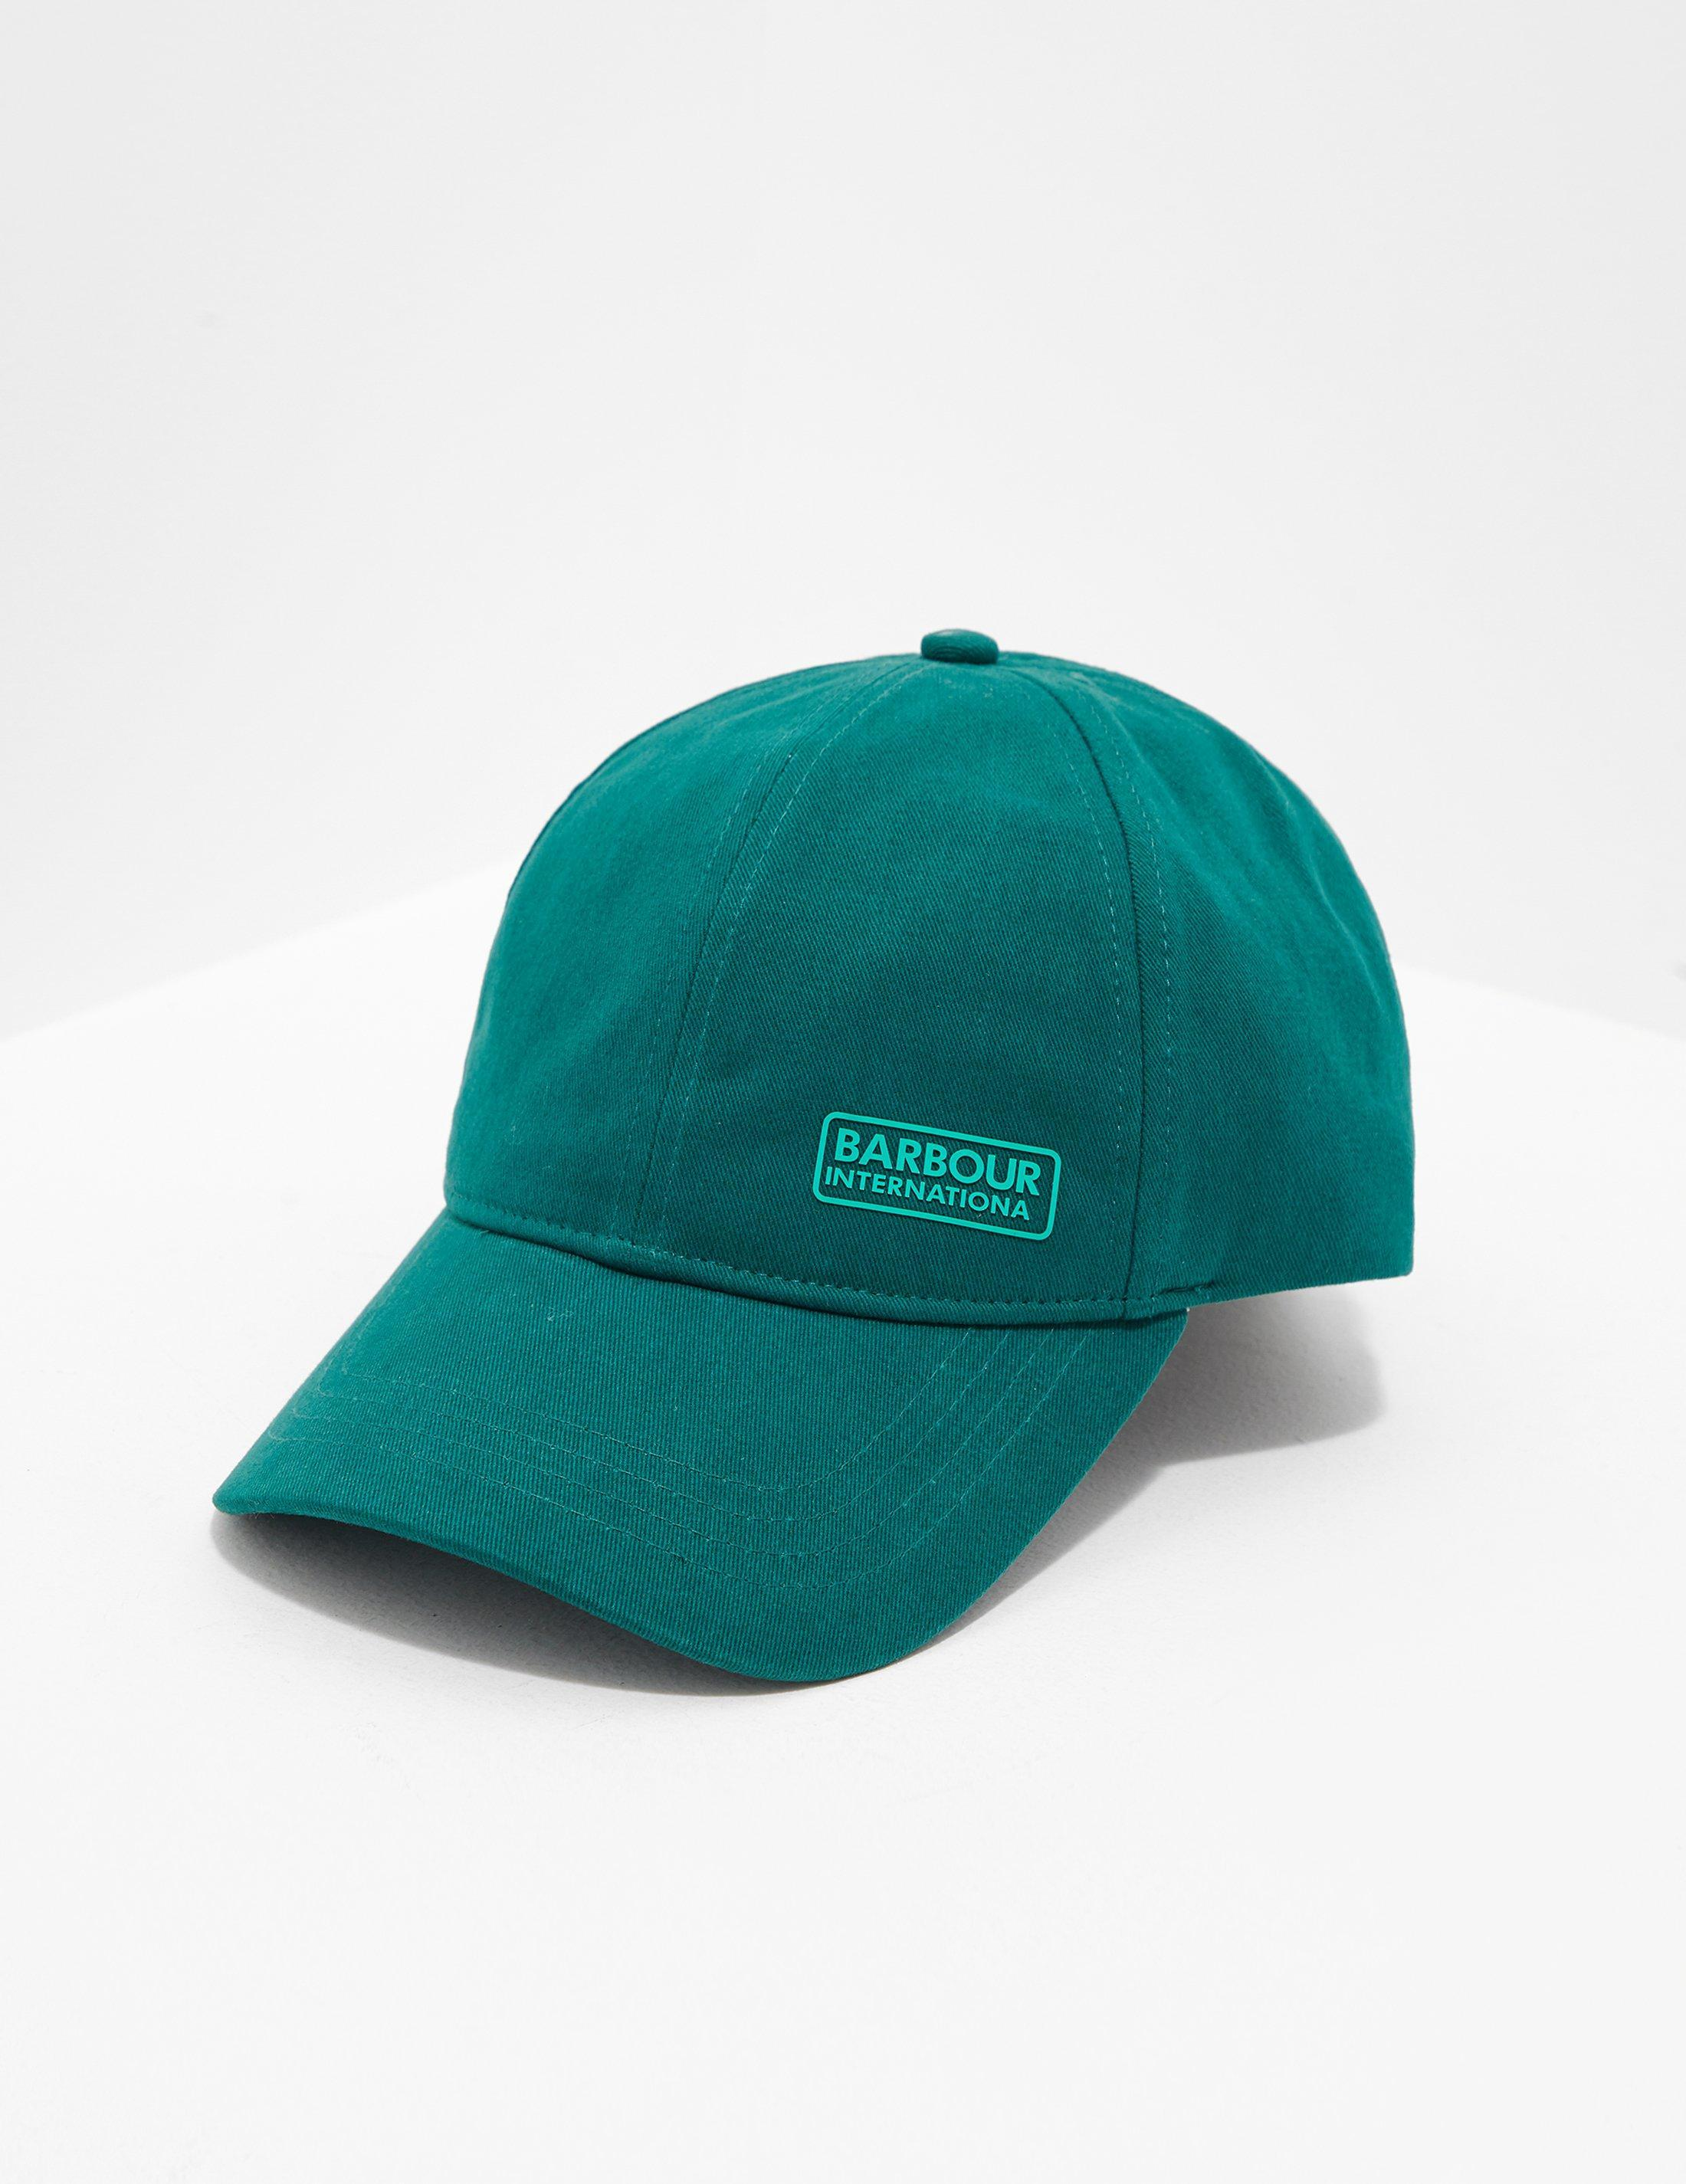 b6c59251e77f22 Lyst - Barbour Norton Drill Cap Green in Green for Men